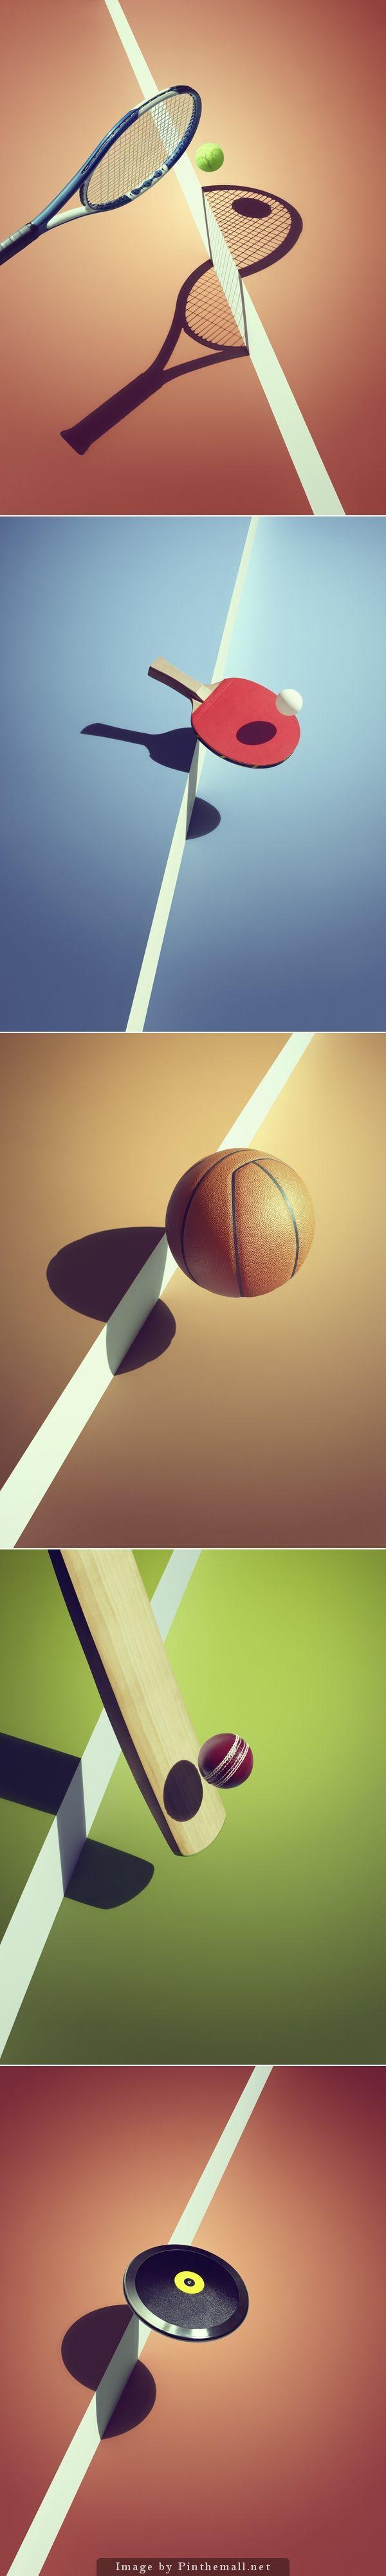 Sports Shadow by Gem Fletcher